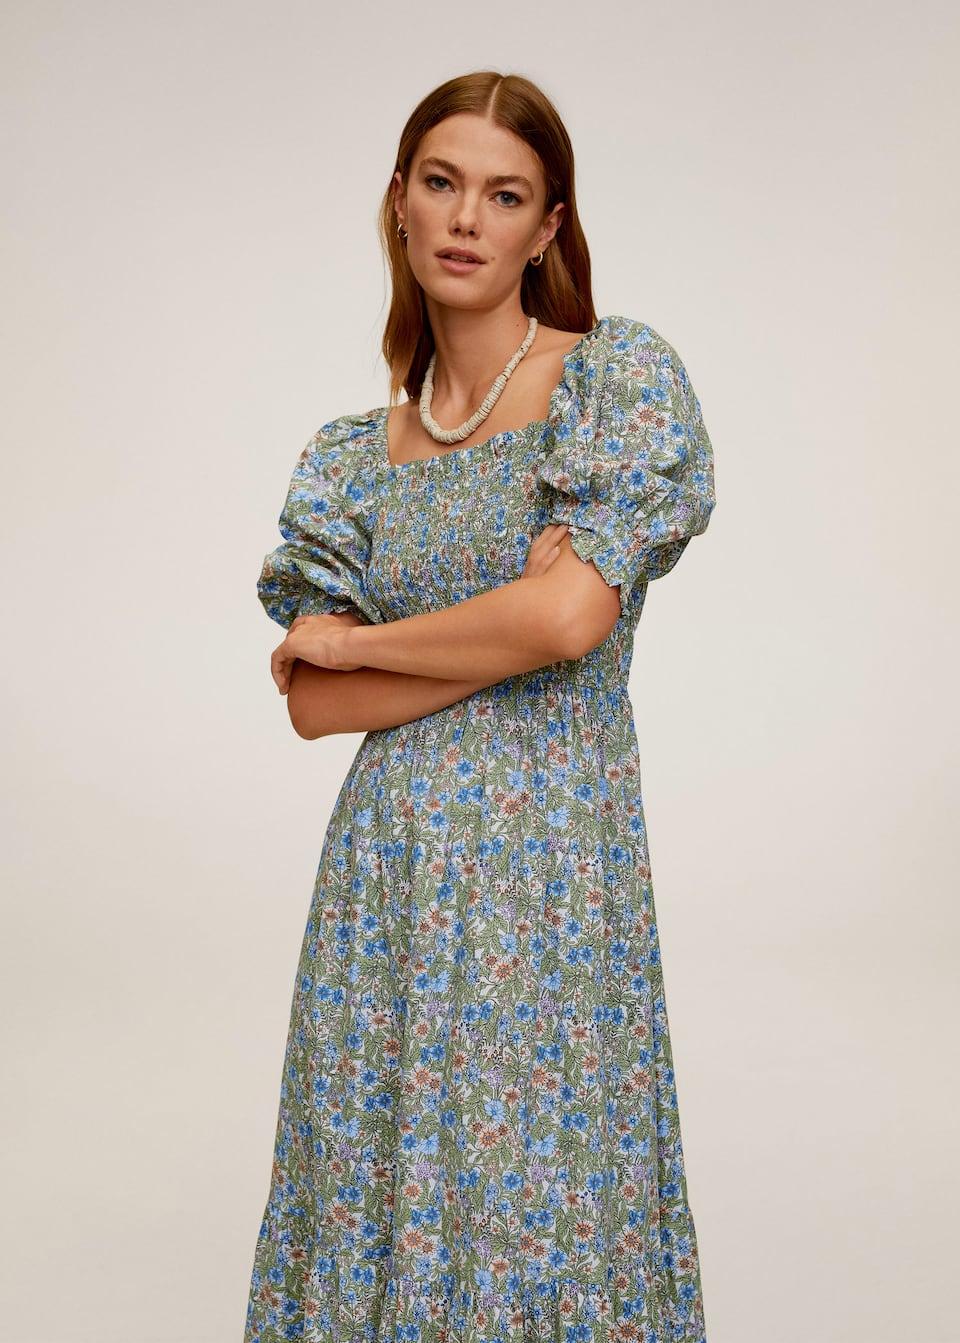 Langes, bedrucktes kleid   Damen   Mango Deutschland